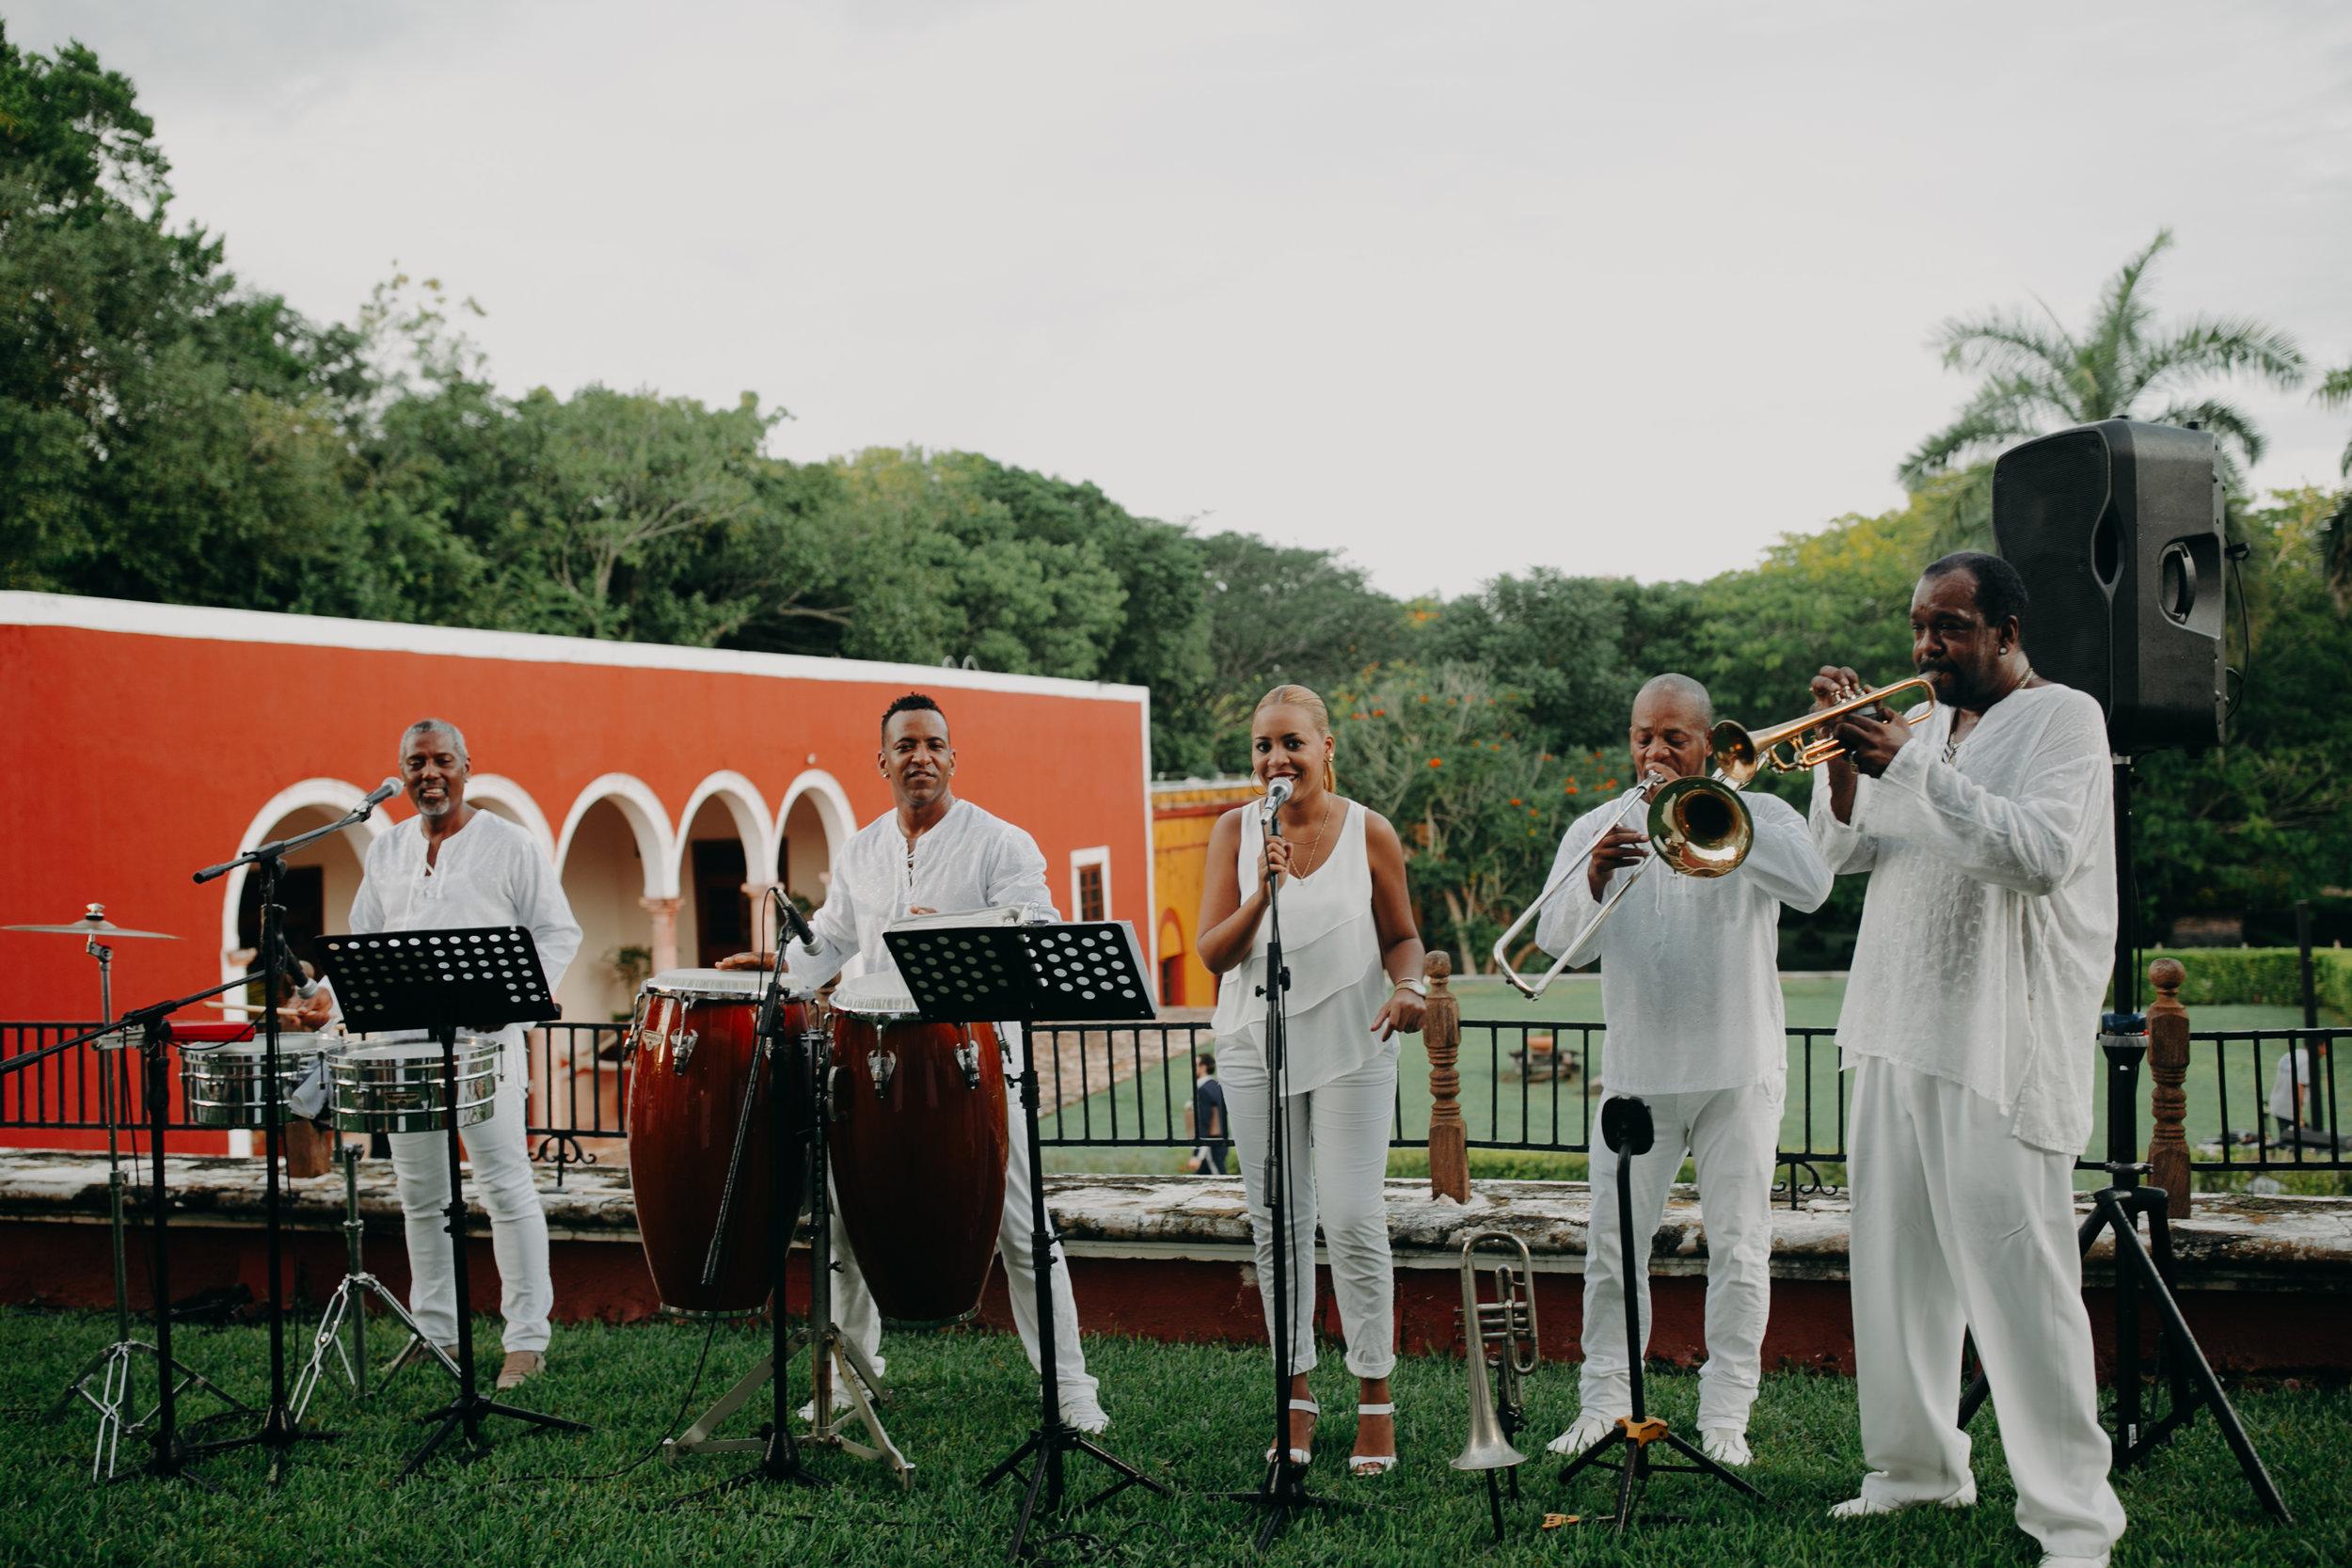 Hacienda Temozon Yucatan Mexico Wedding | Ida & Peter Emily Magers Photography-1227.jpg